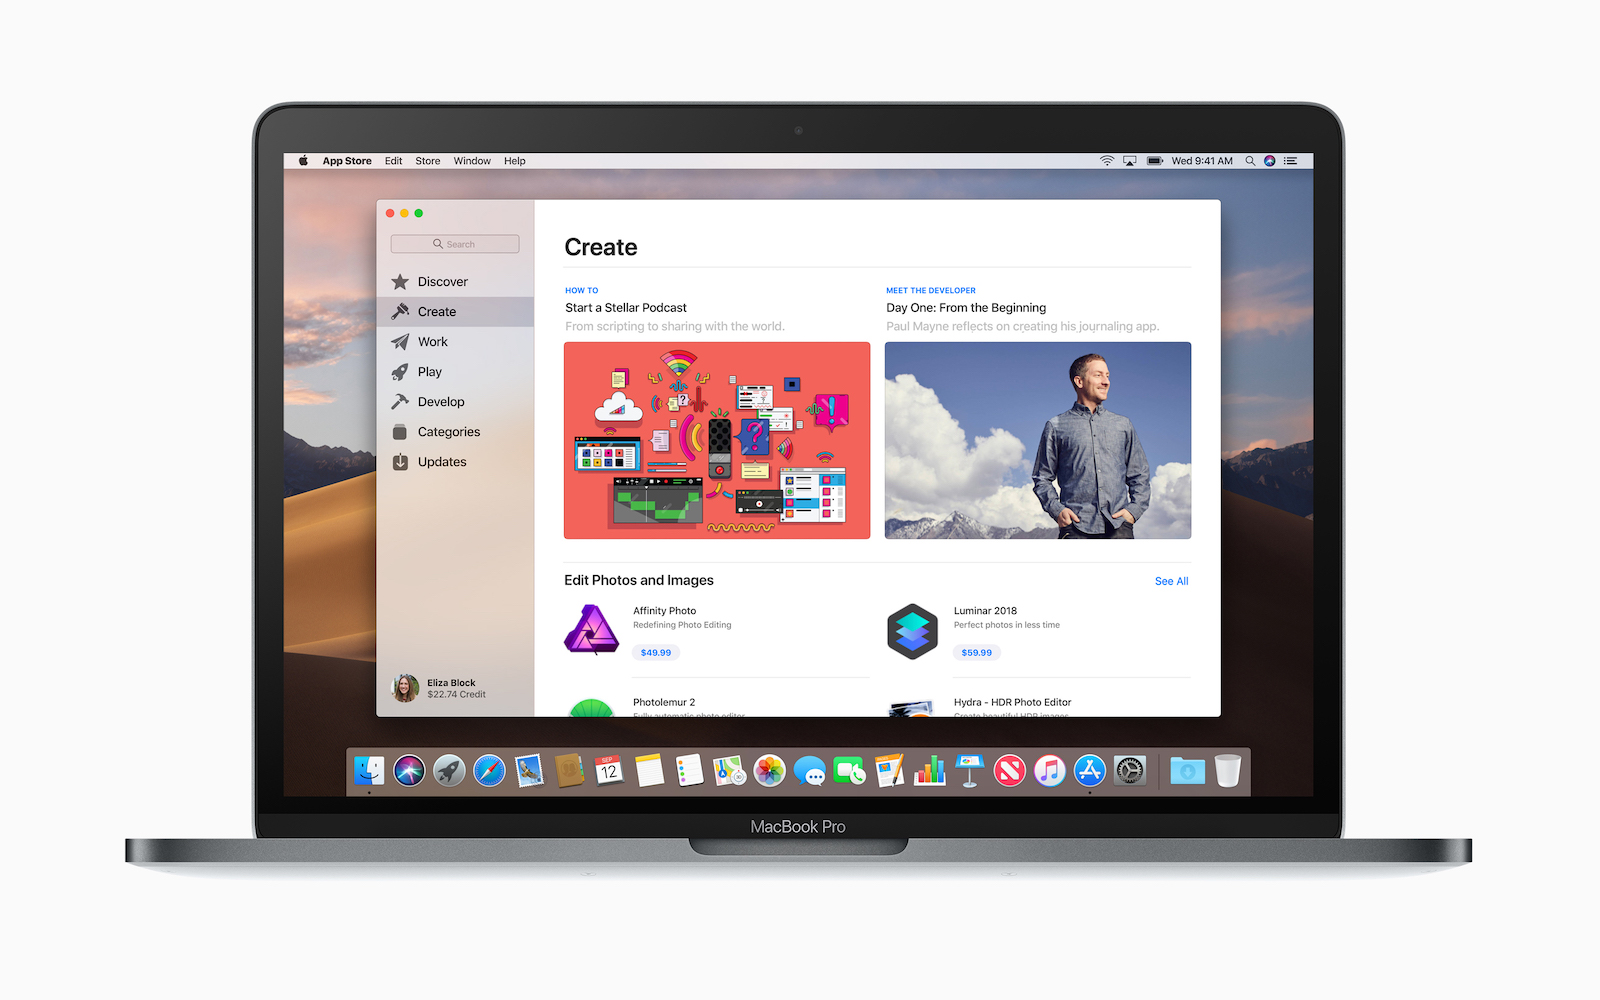 macOS-Mojave-App-Store-iMac-Pro-screen-09242018.jpg